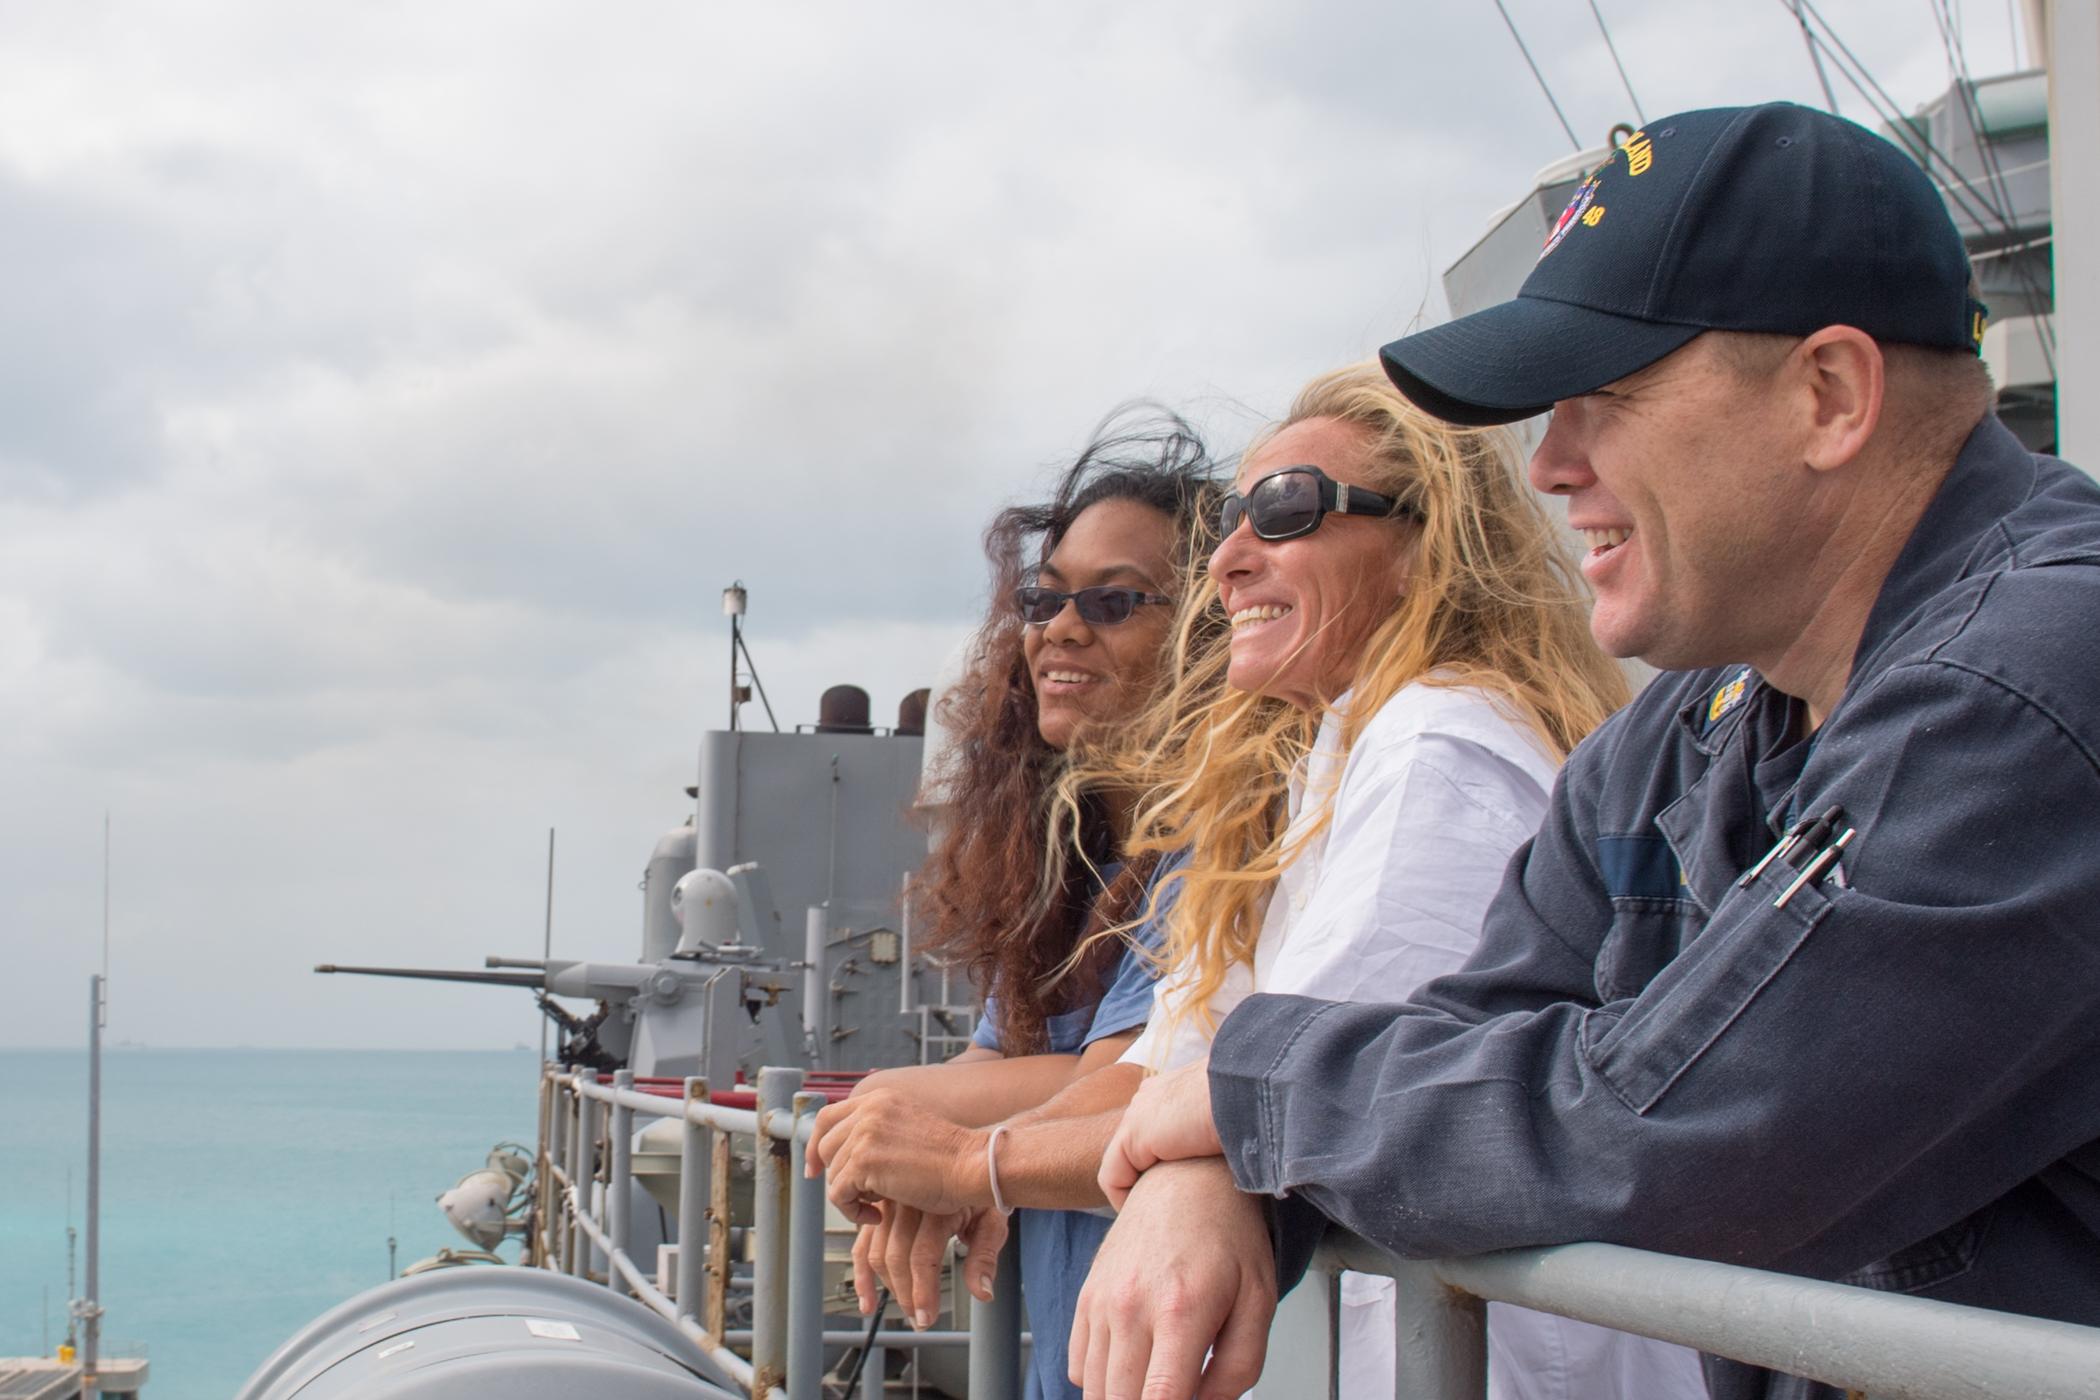 OKINAWA, Japan (Oct. 30, 2017) Natasha Fuiava, left, and Jennifer Appel, center, the two American mariners rescued at sea